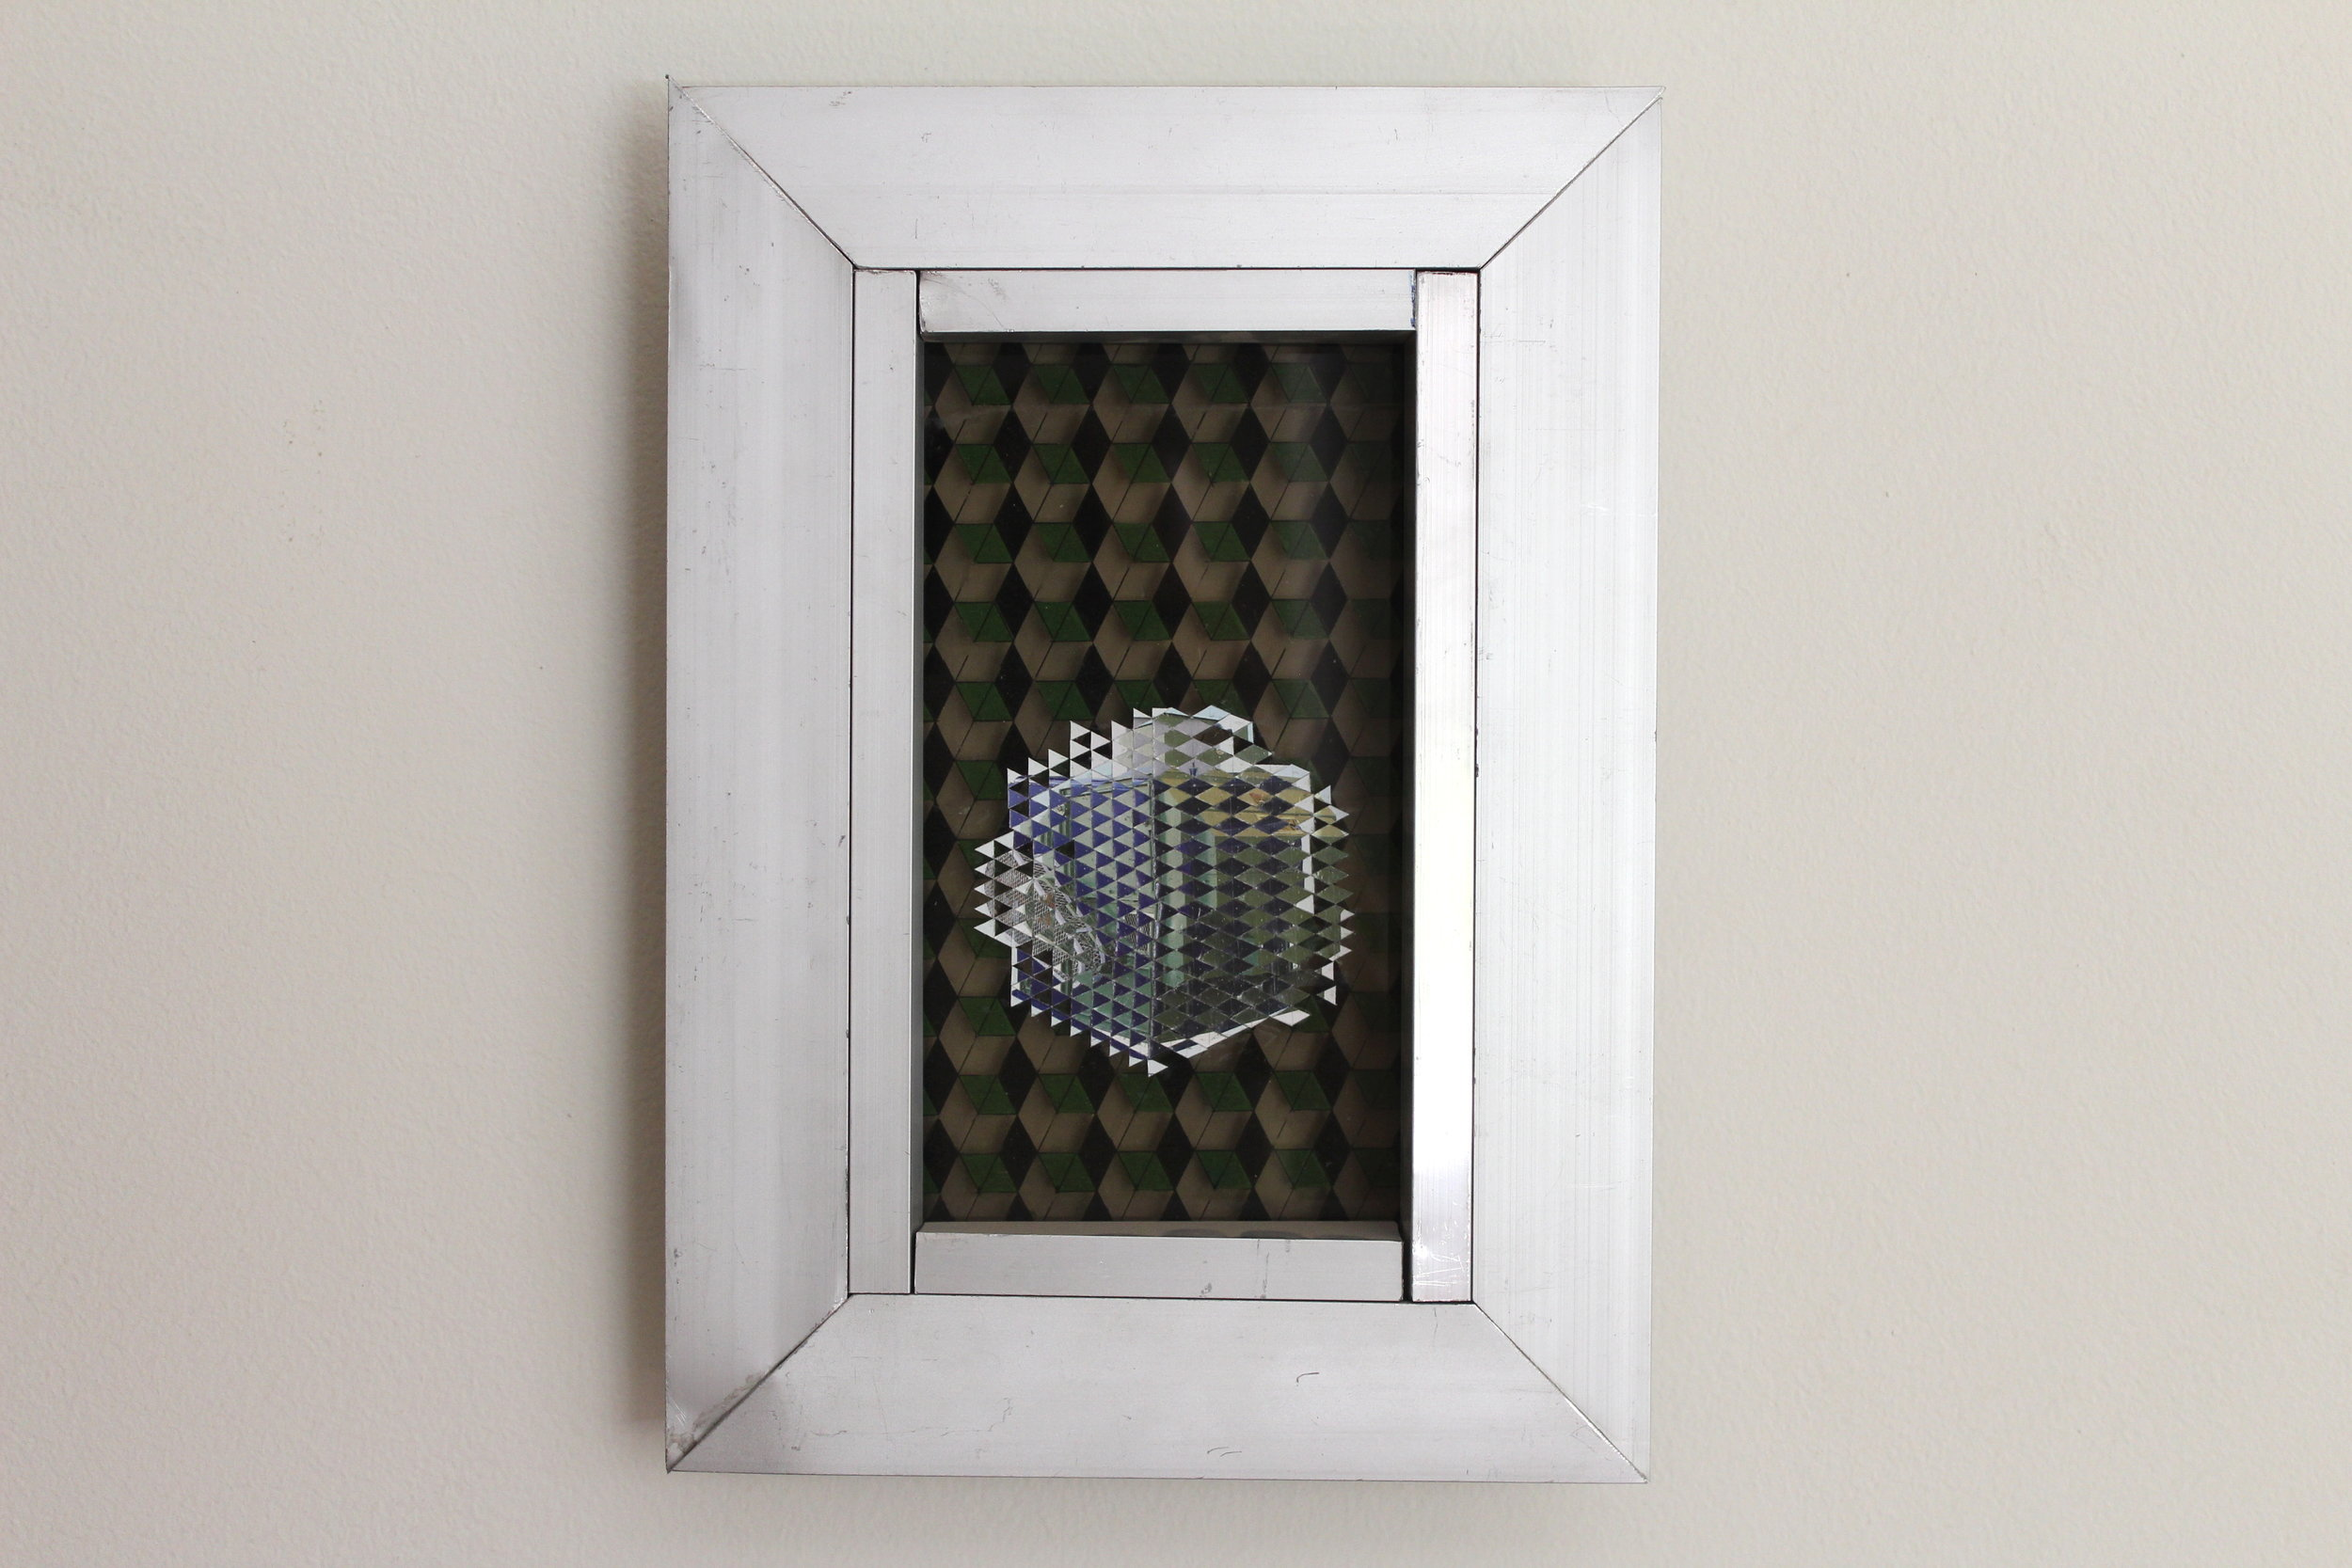 Gravity Stoners (TQSC), 2018, Aluminium - glass - vinyl - catalog, 34.4 x 24.2 x 4 cm.